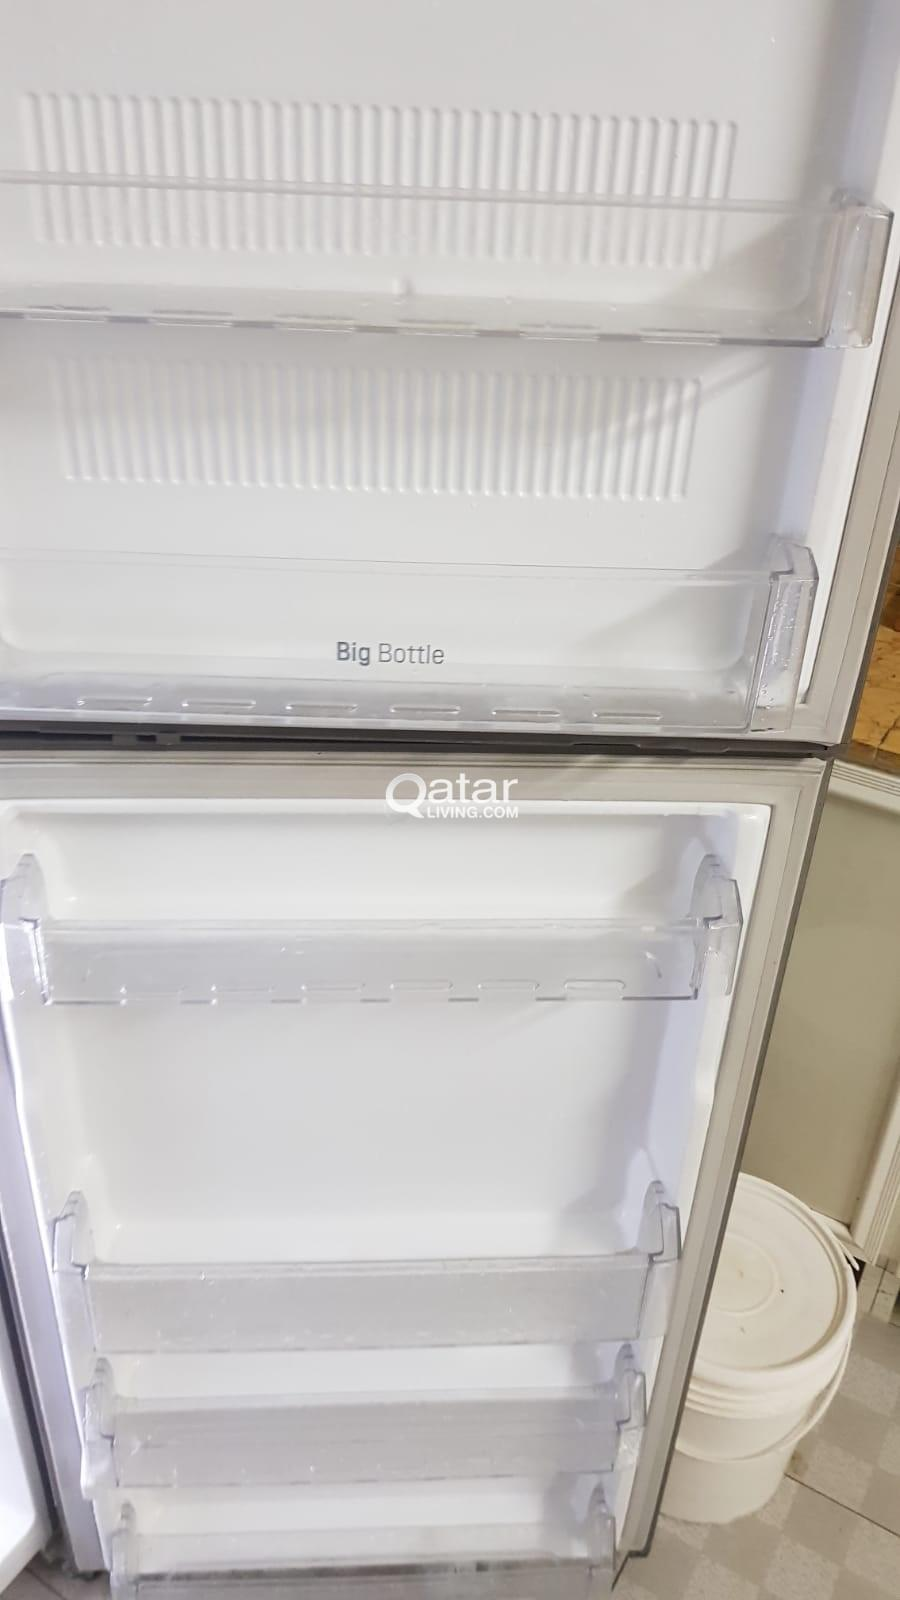 LG Fridge Freezer | Qatar Living